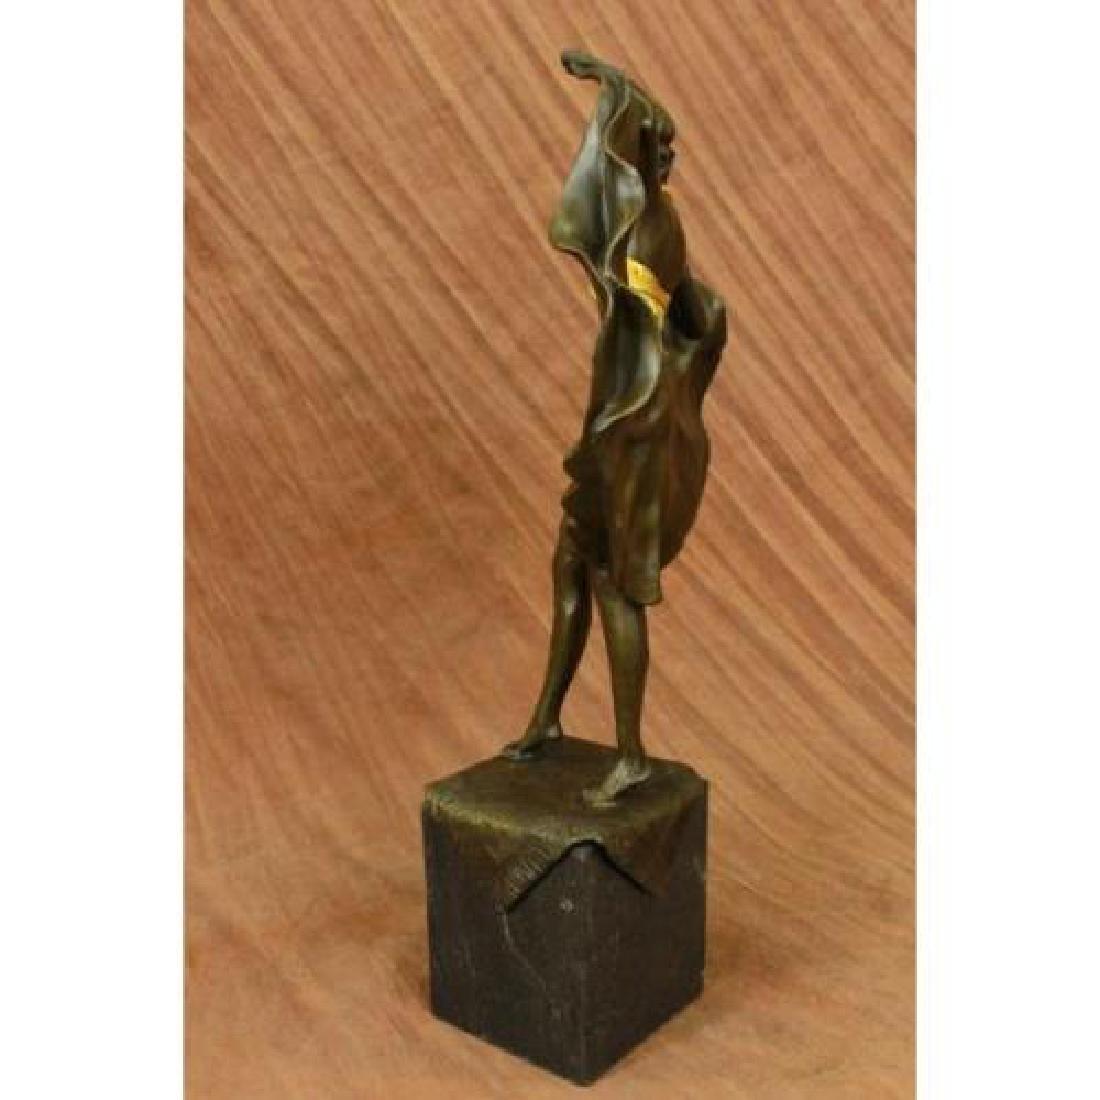 Arabian Girl With Lifting Skirt on Rug Bronze Sculpture - 5